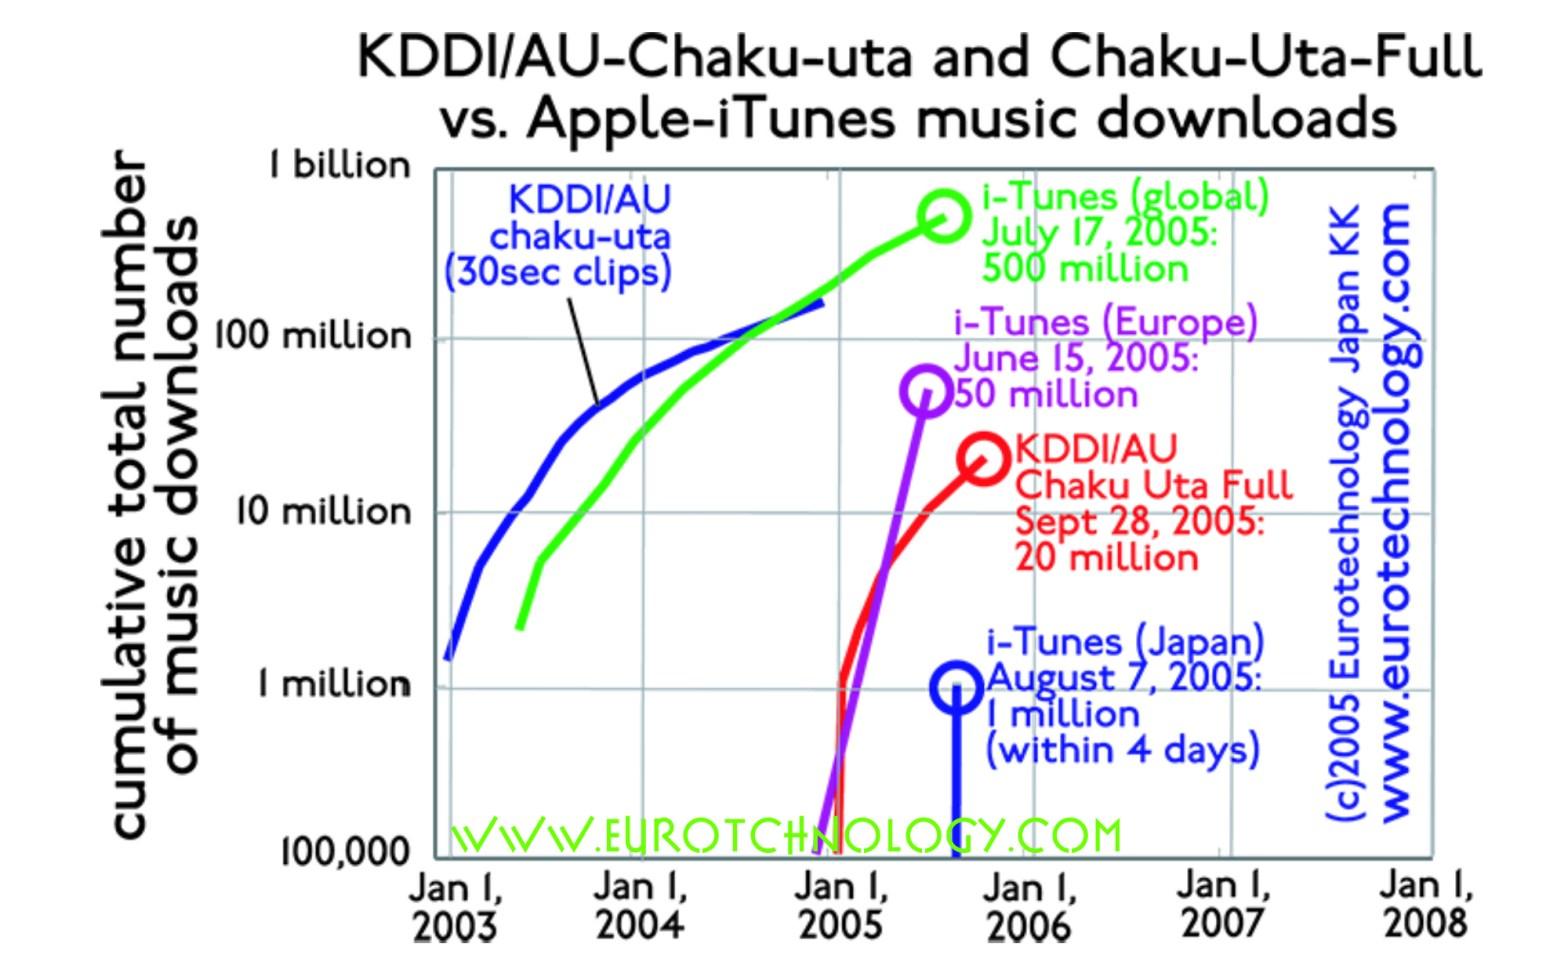 Chaku-Uta-Full: 5 million mobile music downloads in Japan KDDI pioneers full lengths mobile music song downloads via 3G